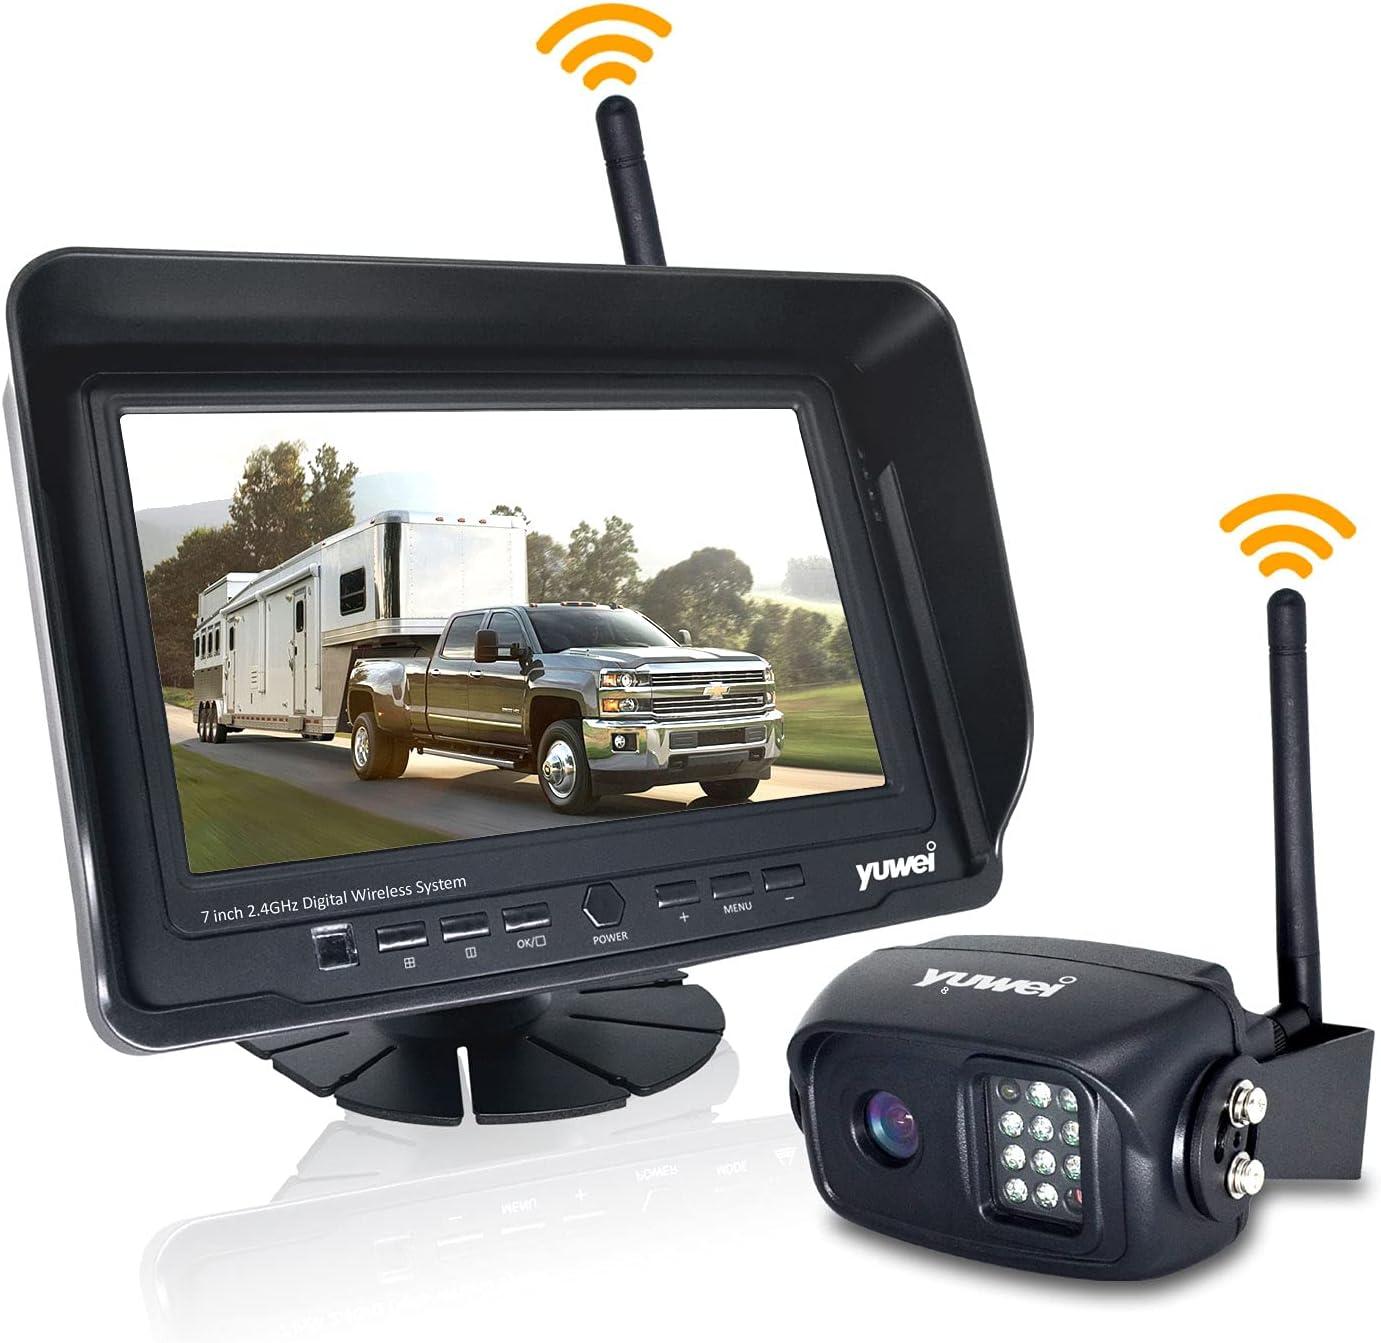 Yuwei YW-17211 Digital Wireless Backup Camera